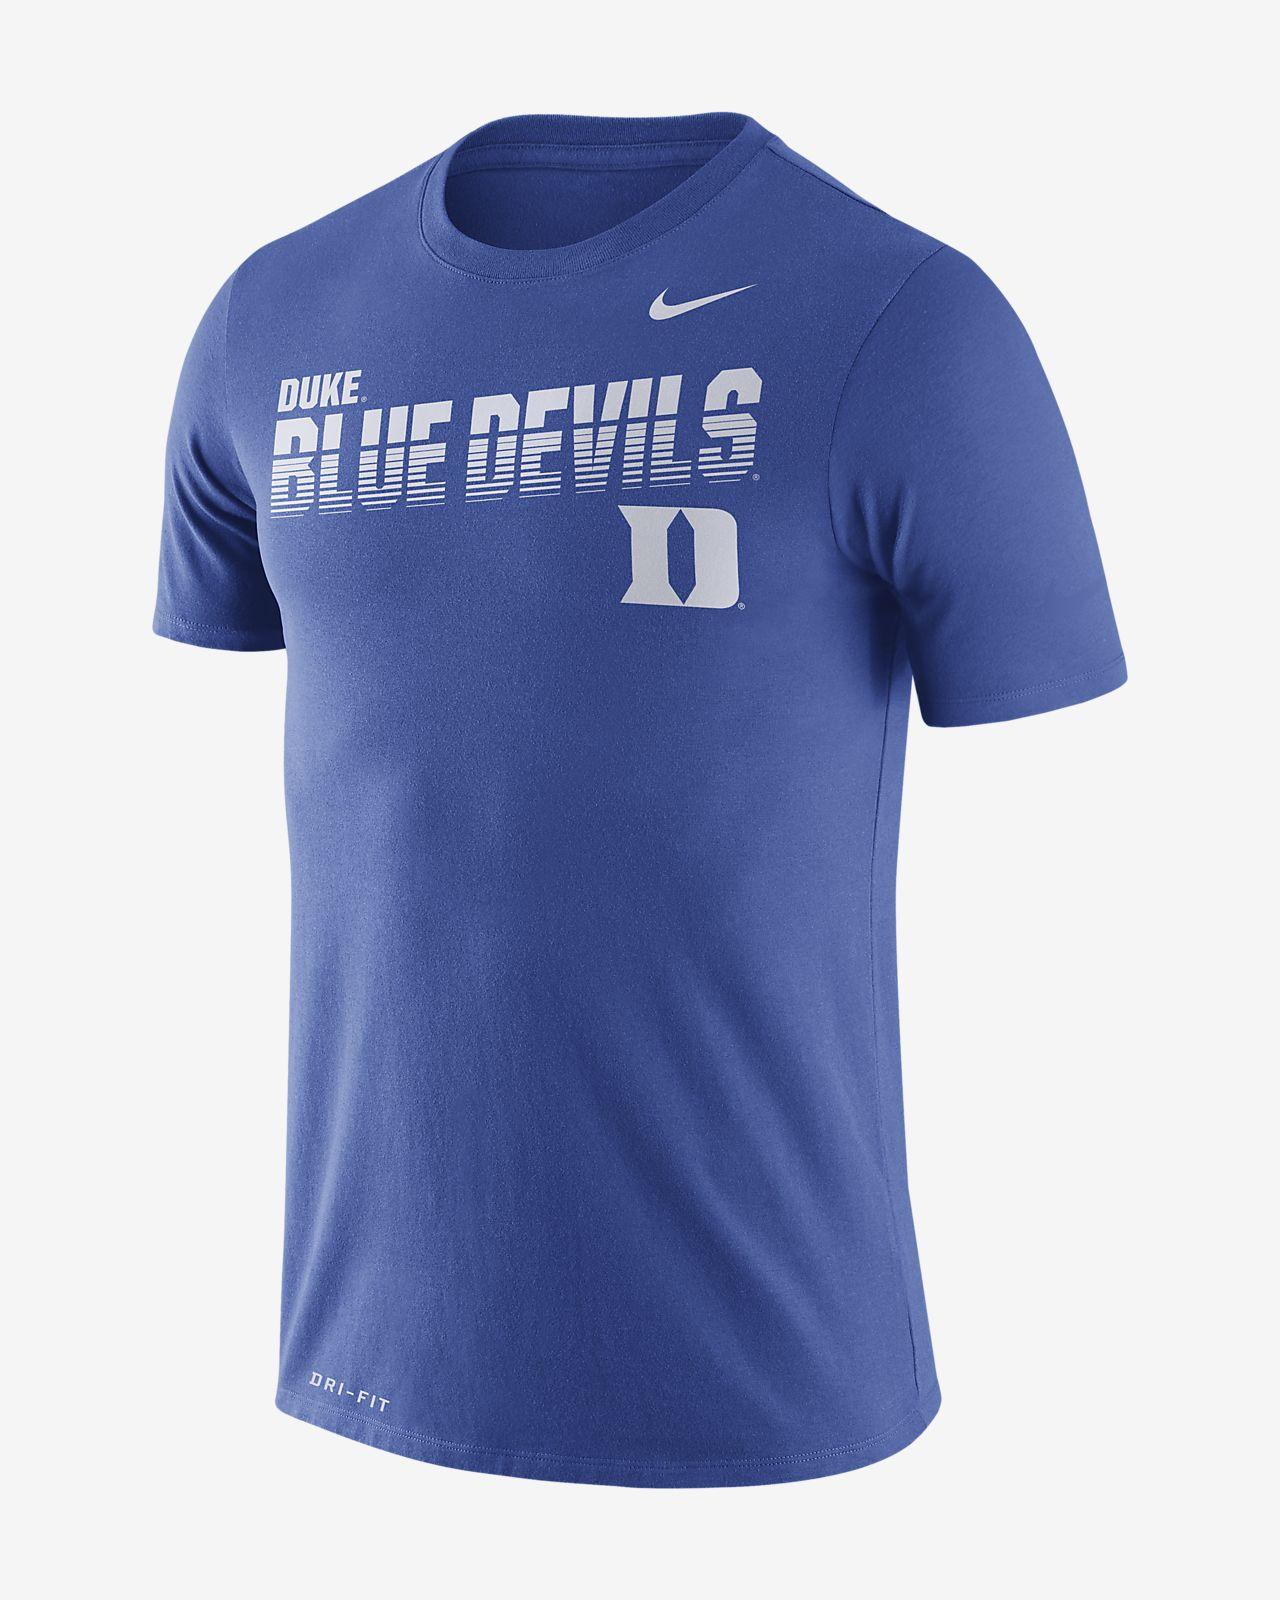 Nike College Dri-FIT Legend (Duke) Men's T-Shirt